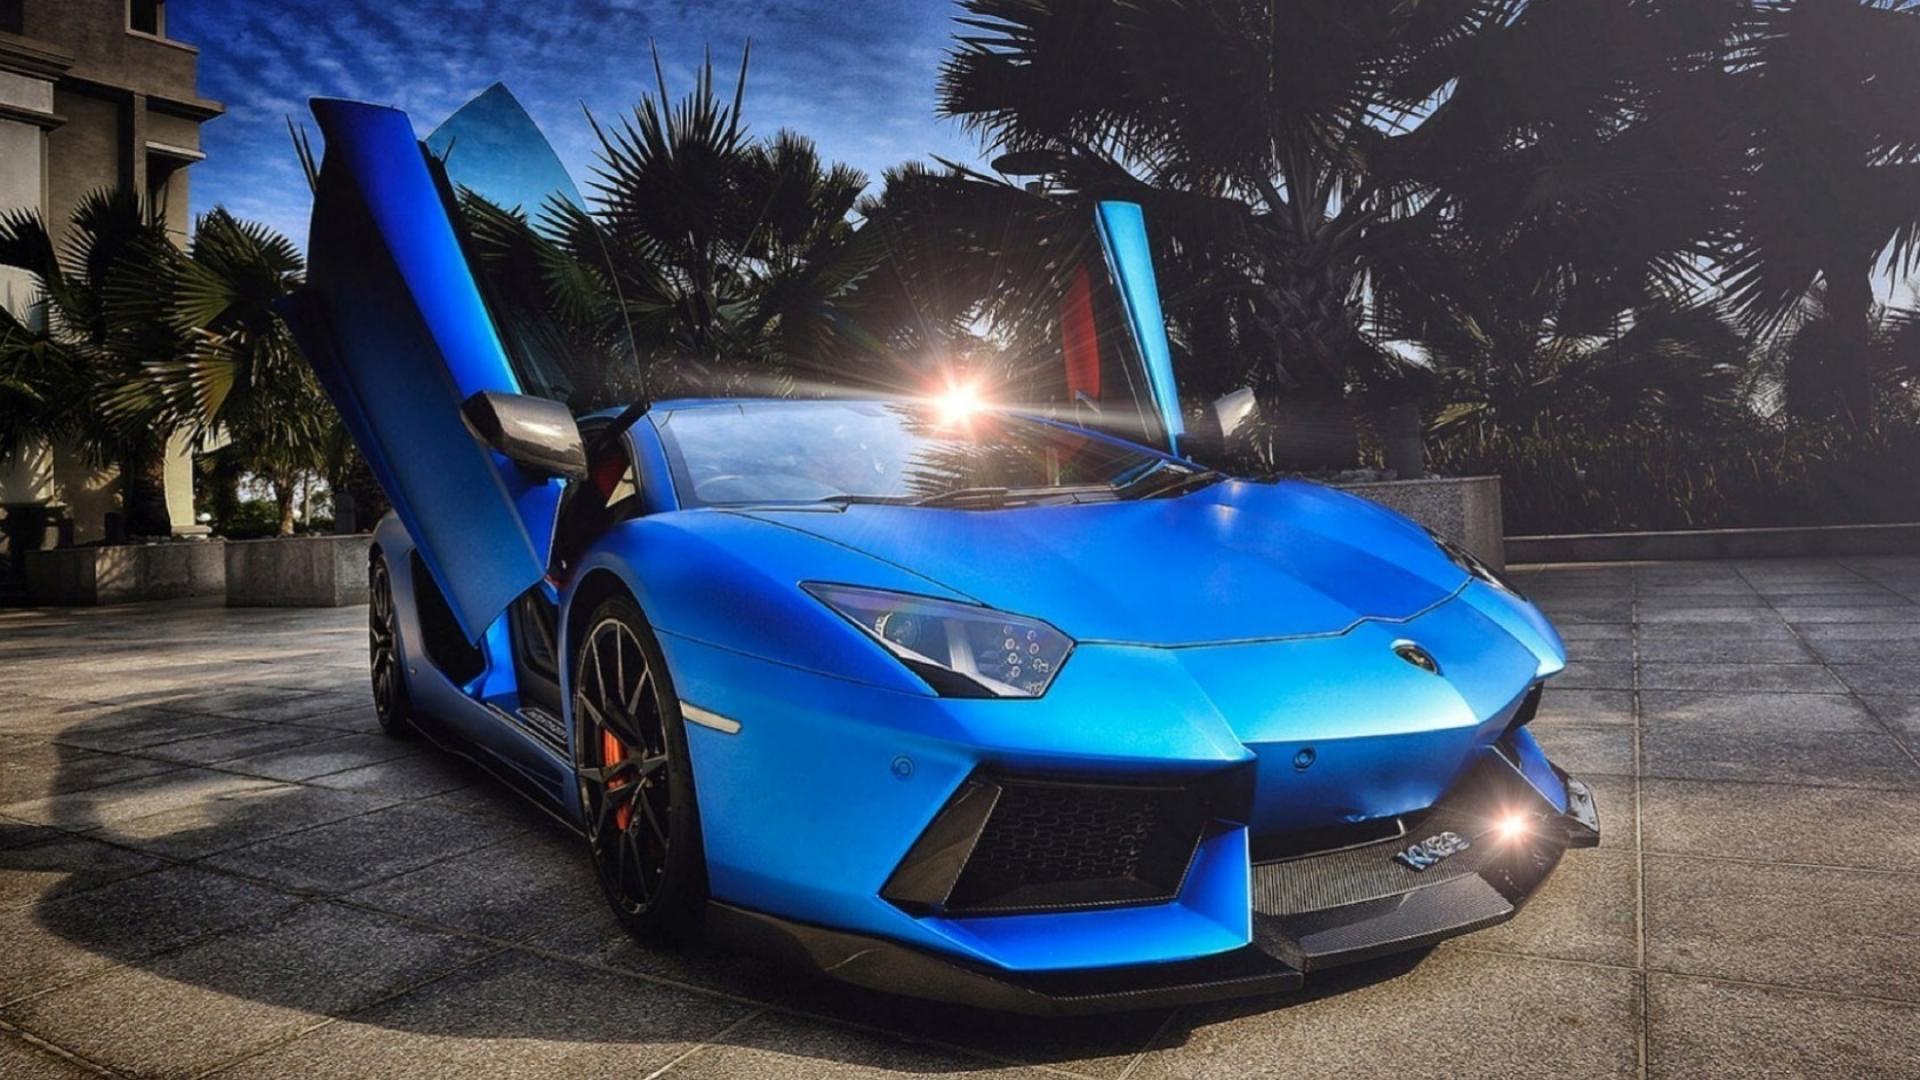 Lamborghini Blue Wallpapers Wallpaper Cave